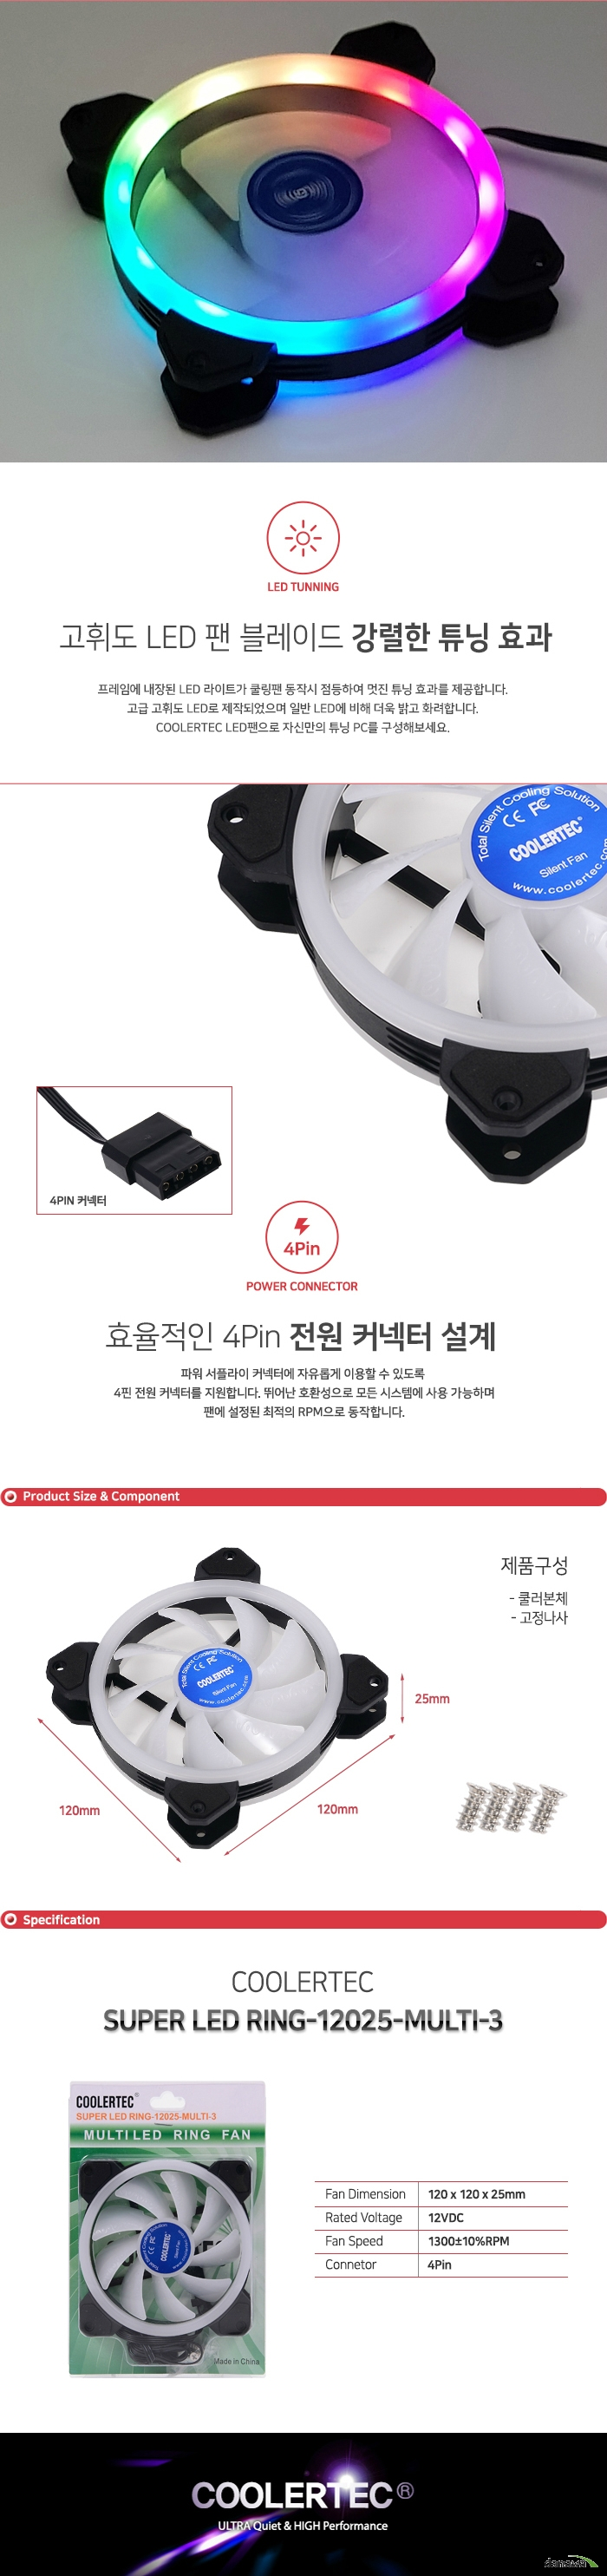 COOLERTEC SUPER LED RING-12025-MULTI-3